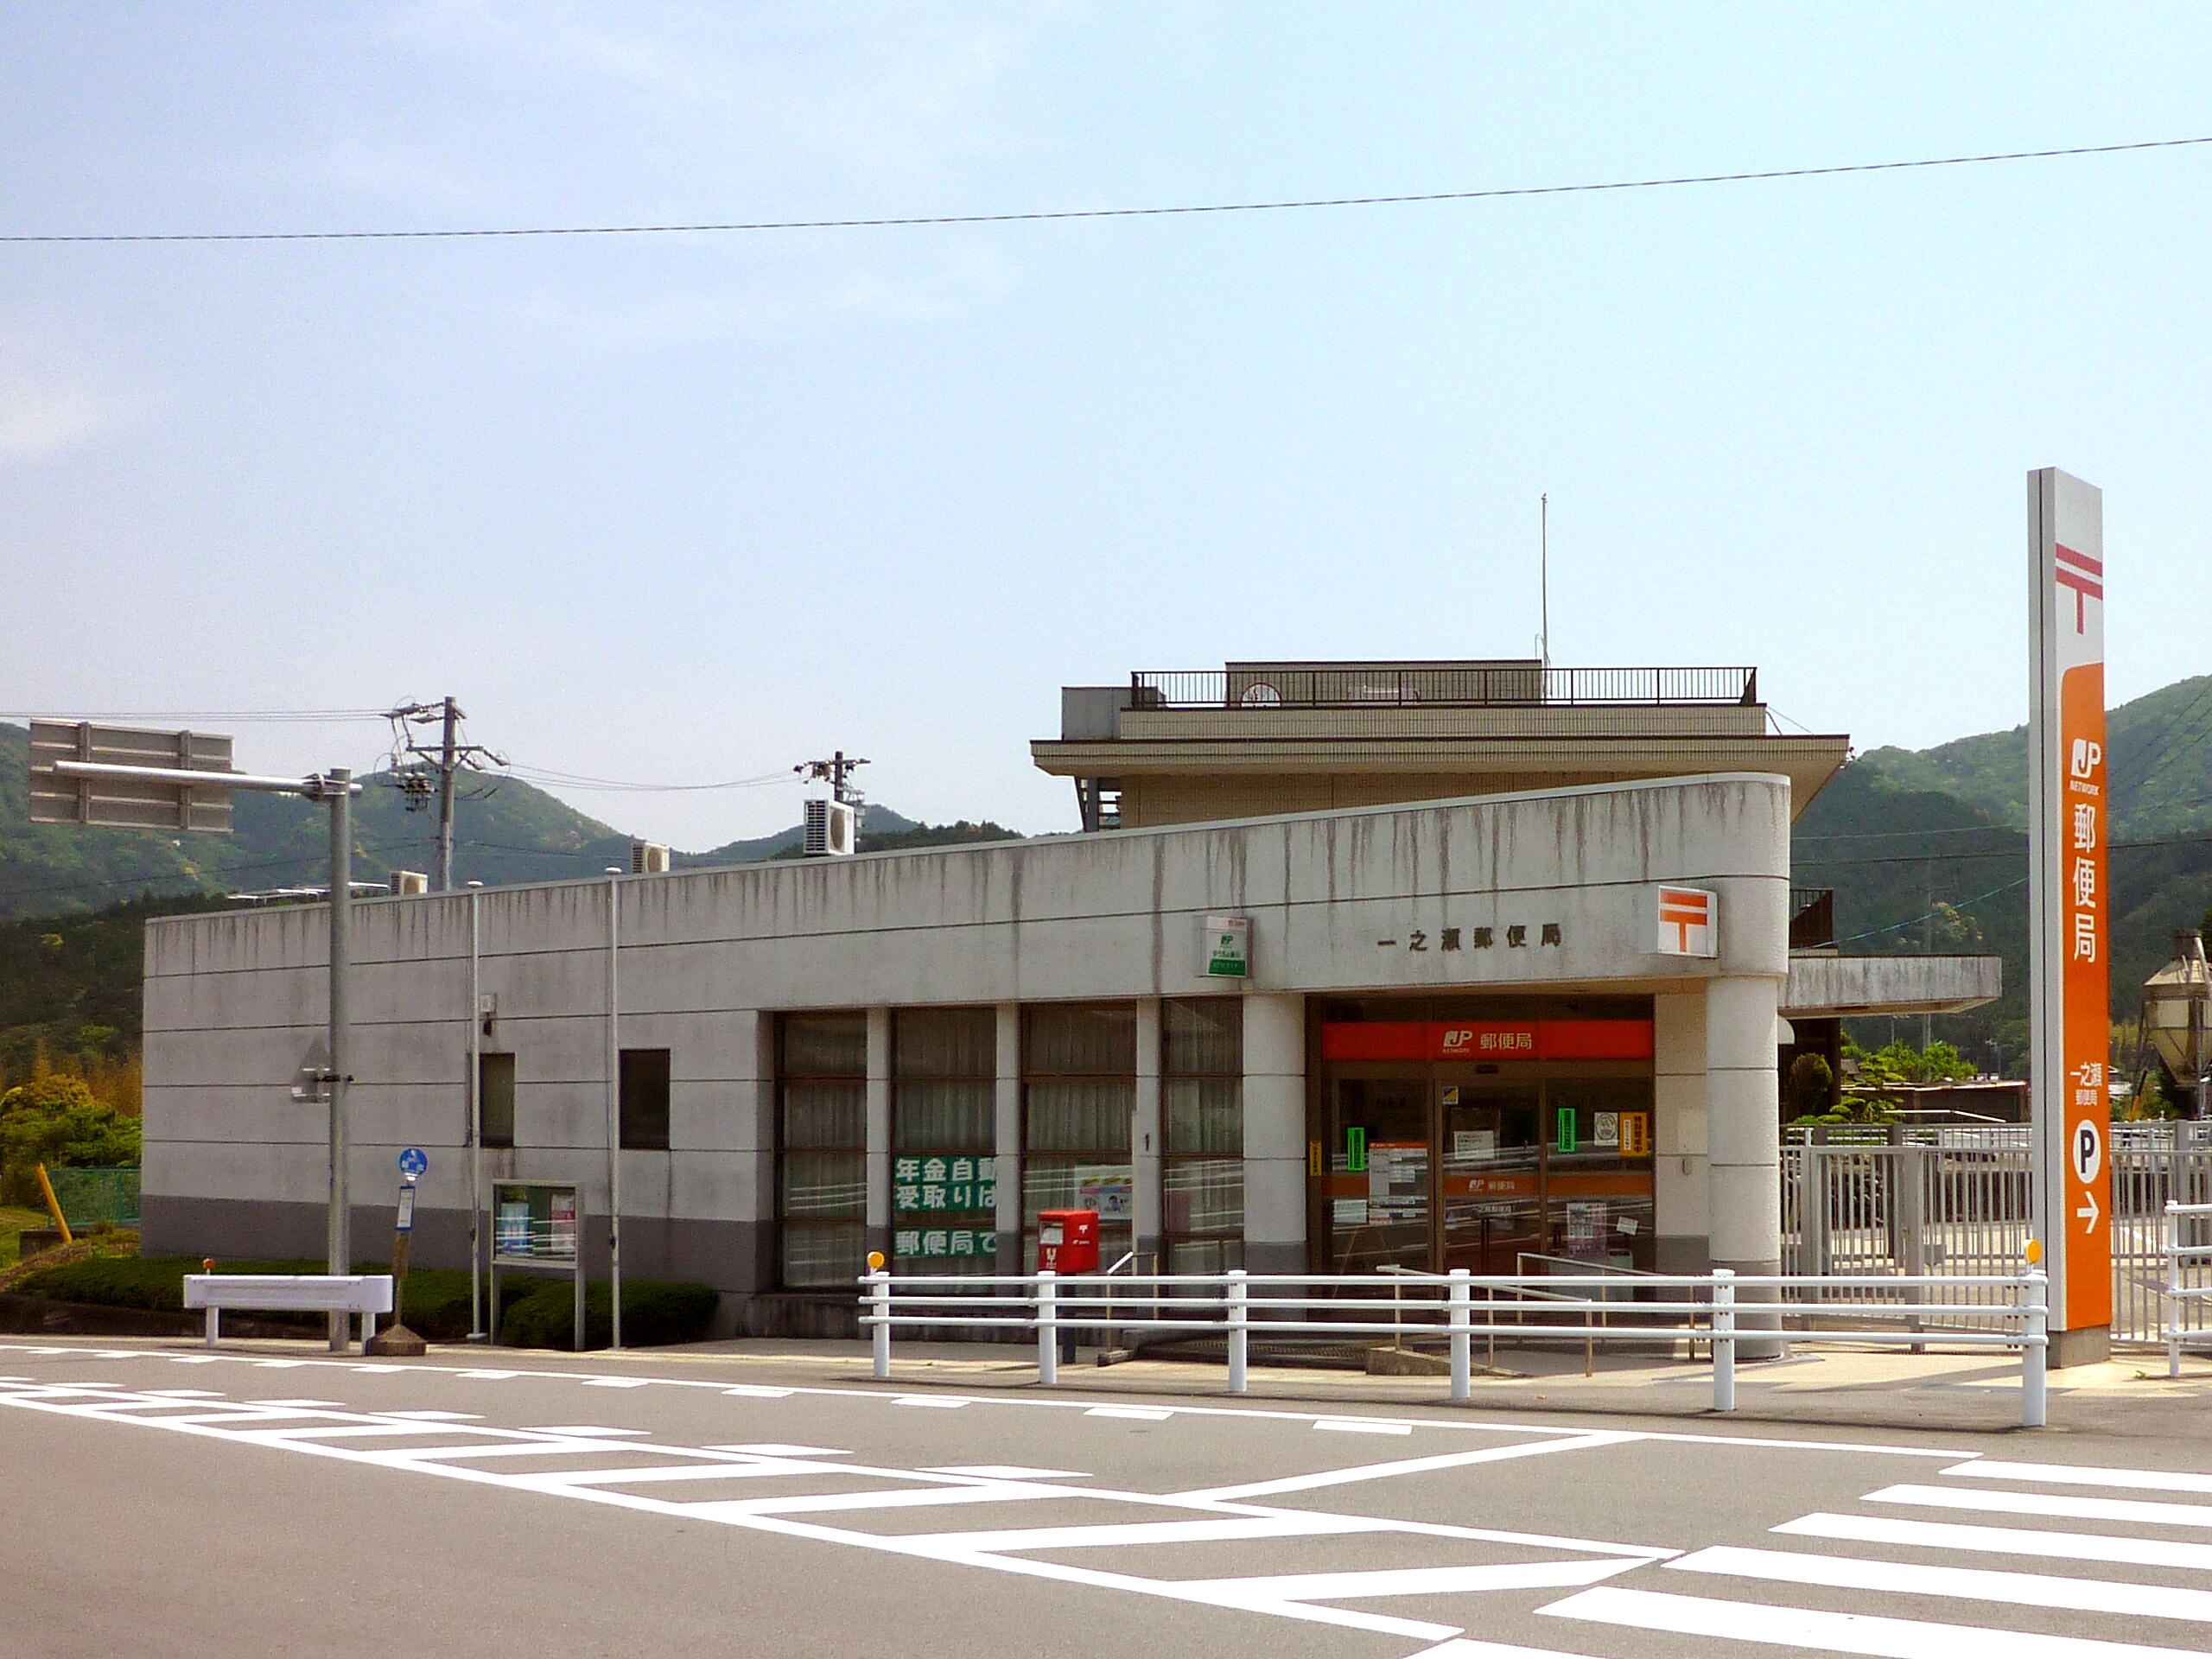 fileichinose post office mie japan 20090510jpg wikimedia commons